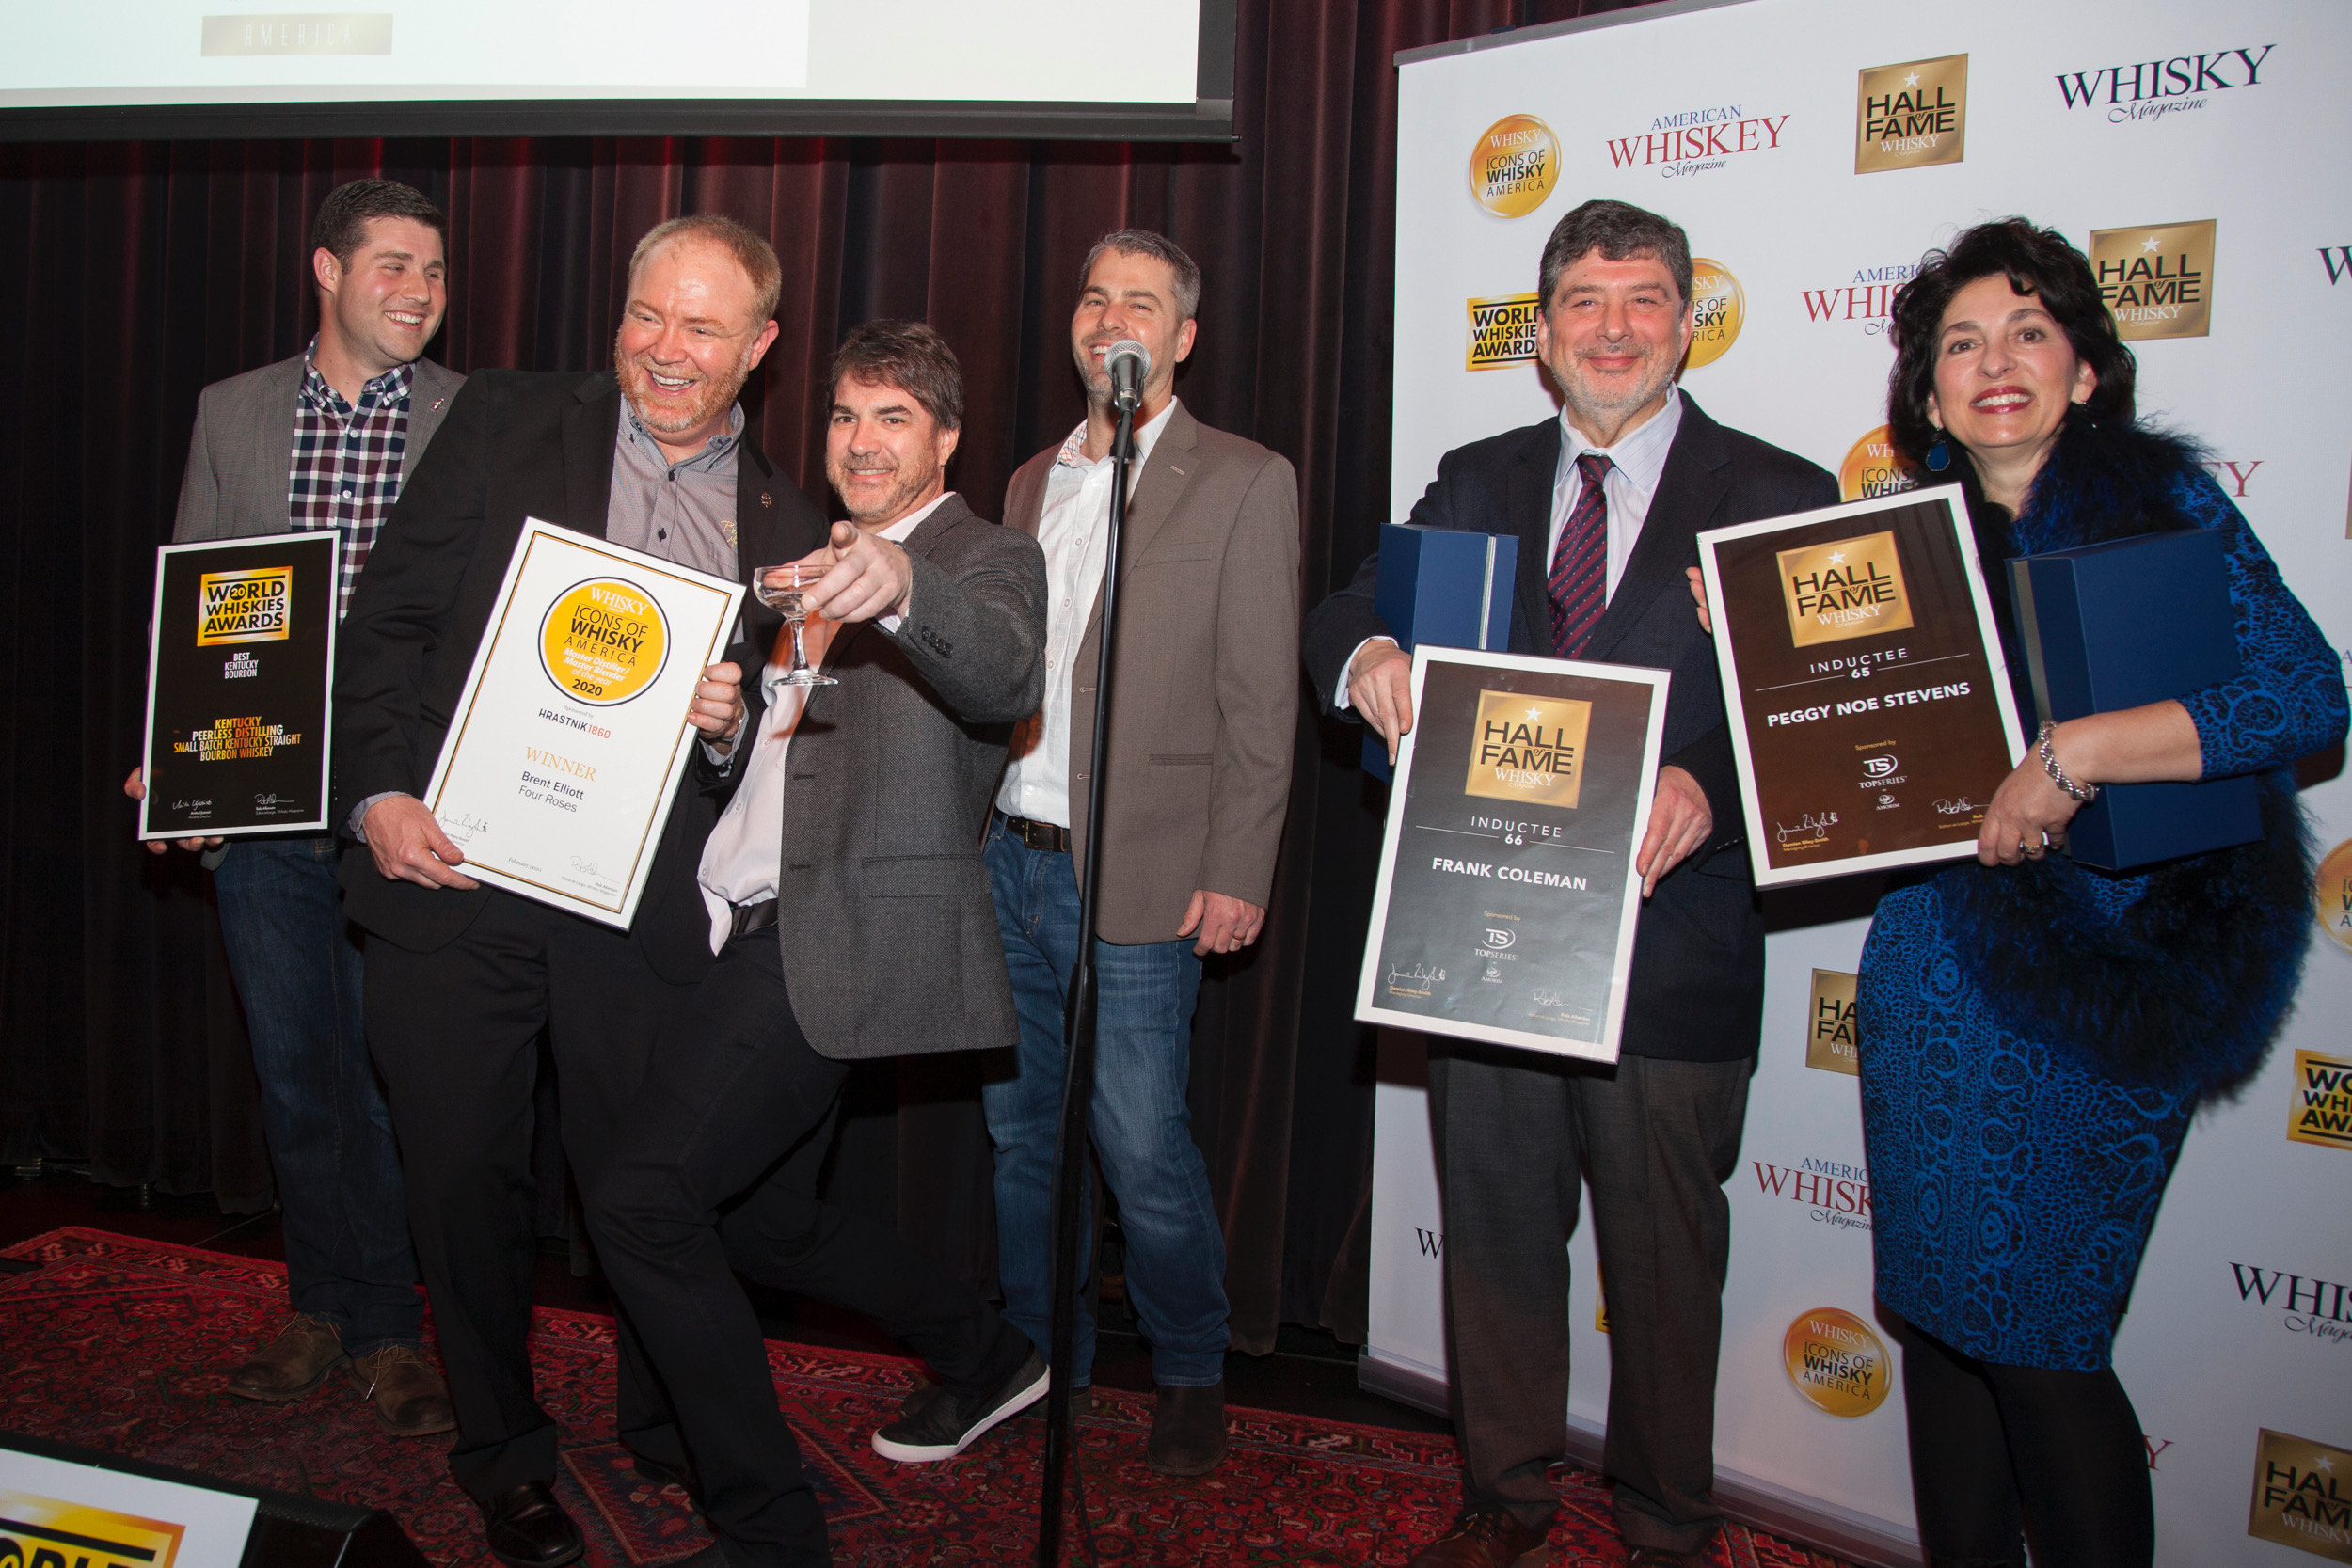 World Whiskies Awards Best Kentucky Bourbon